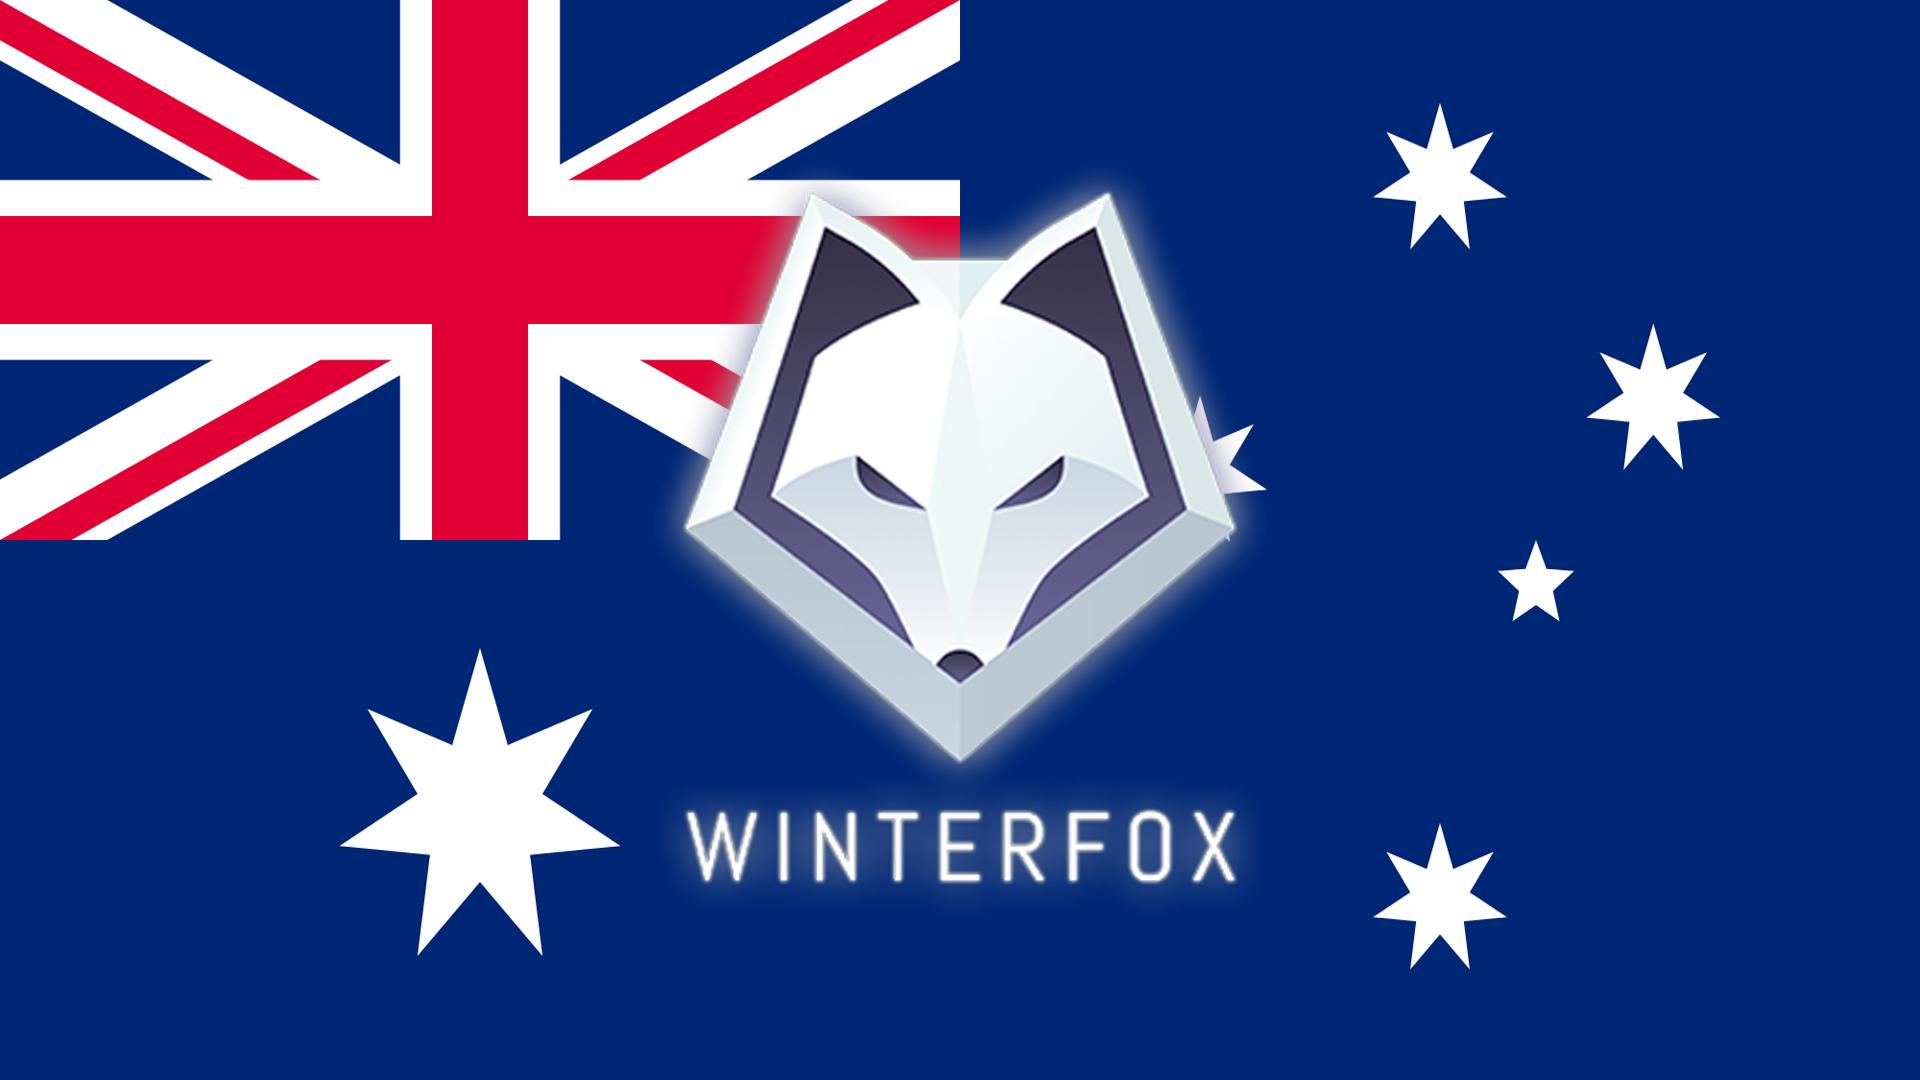 Winterfox Australia